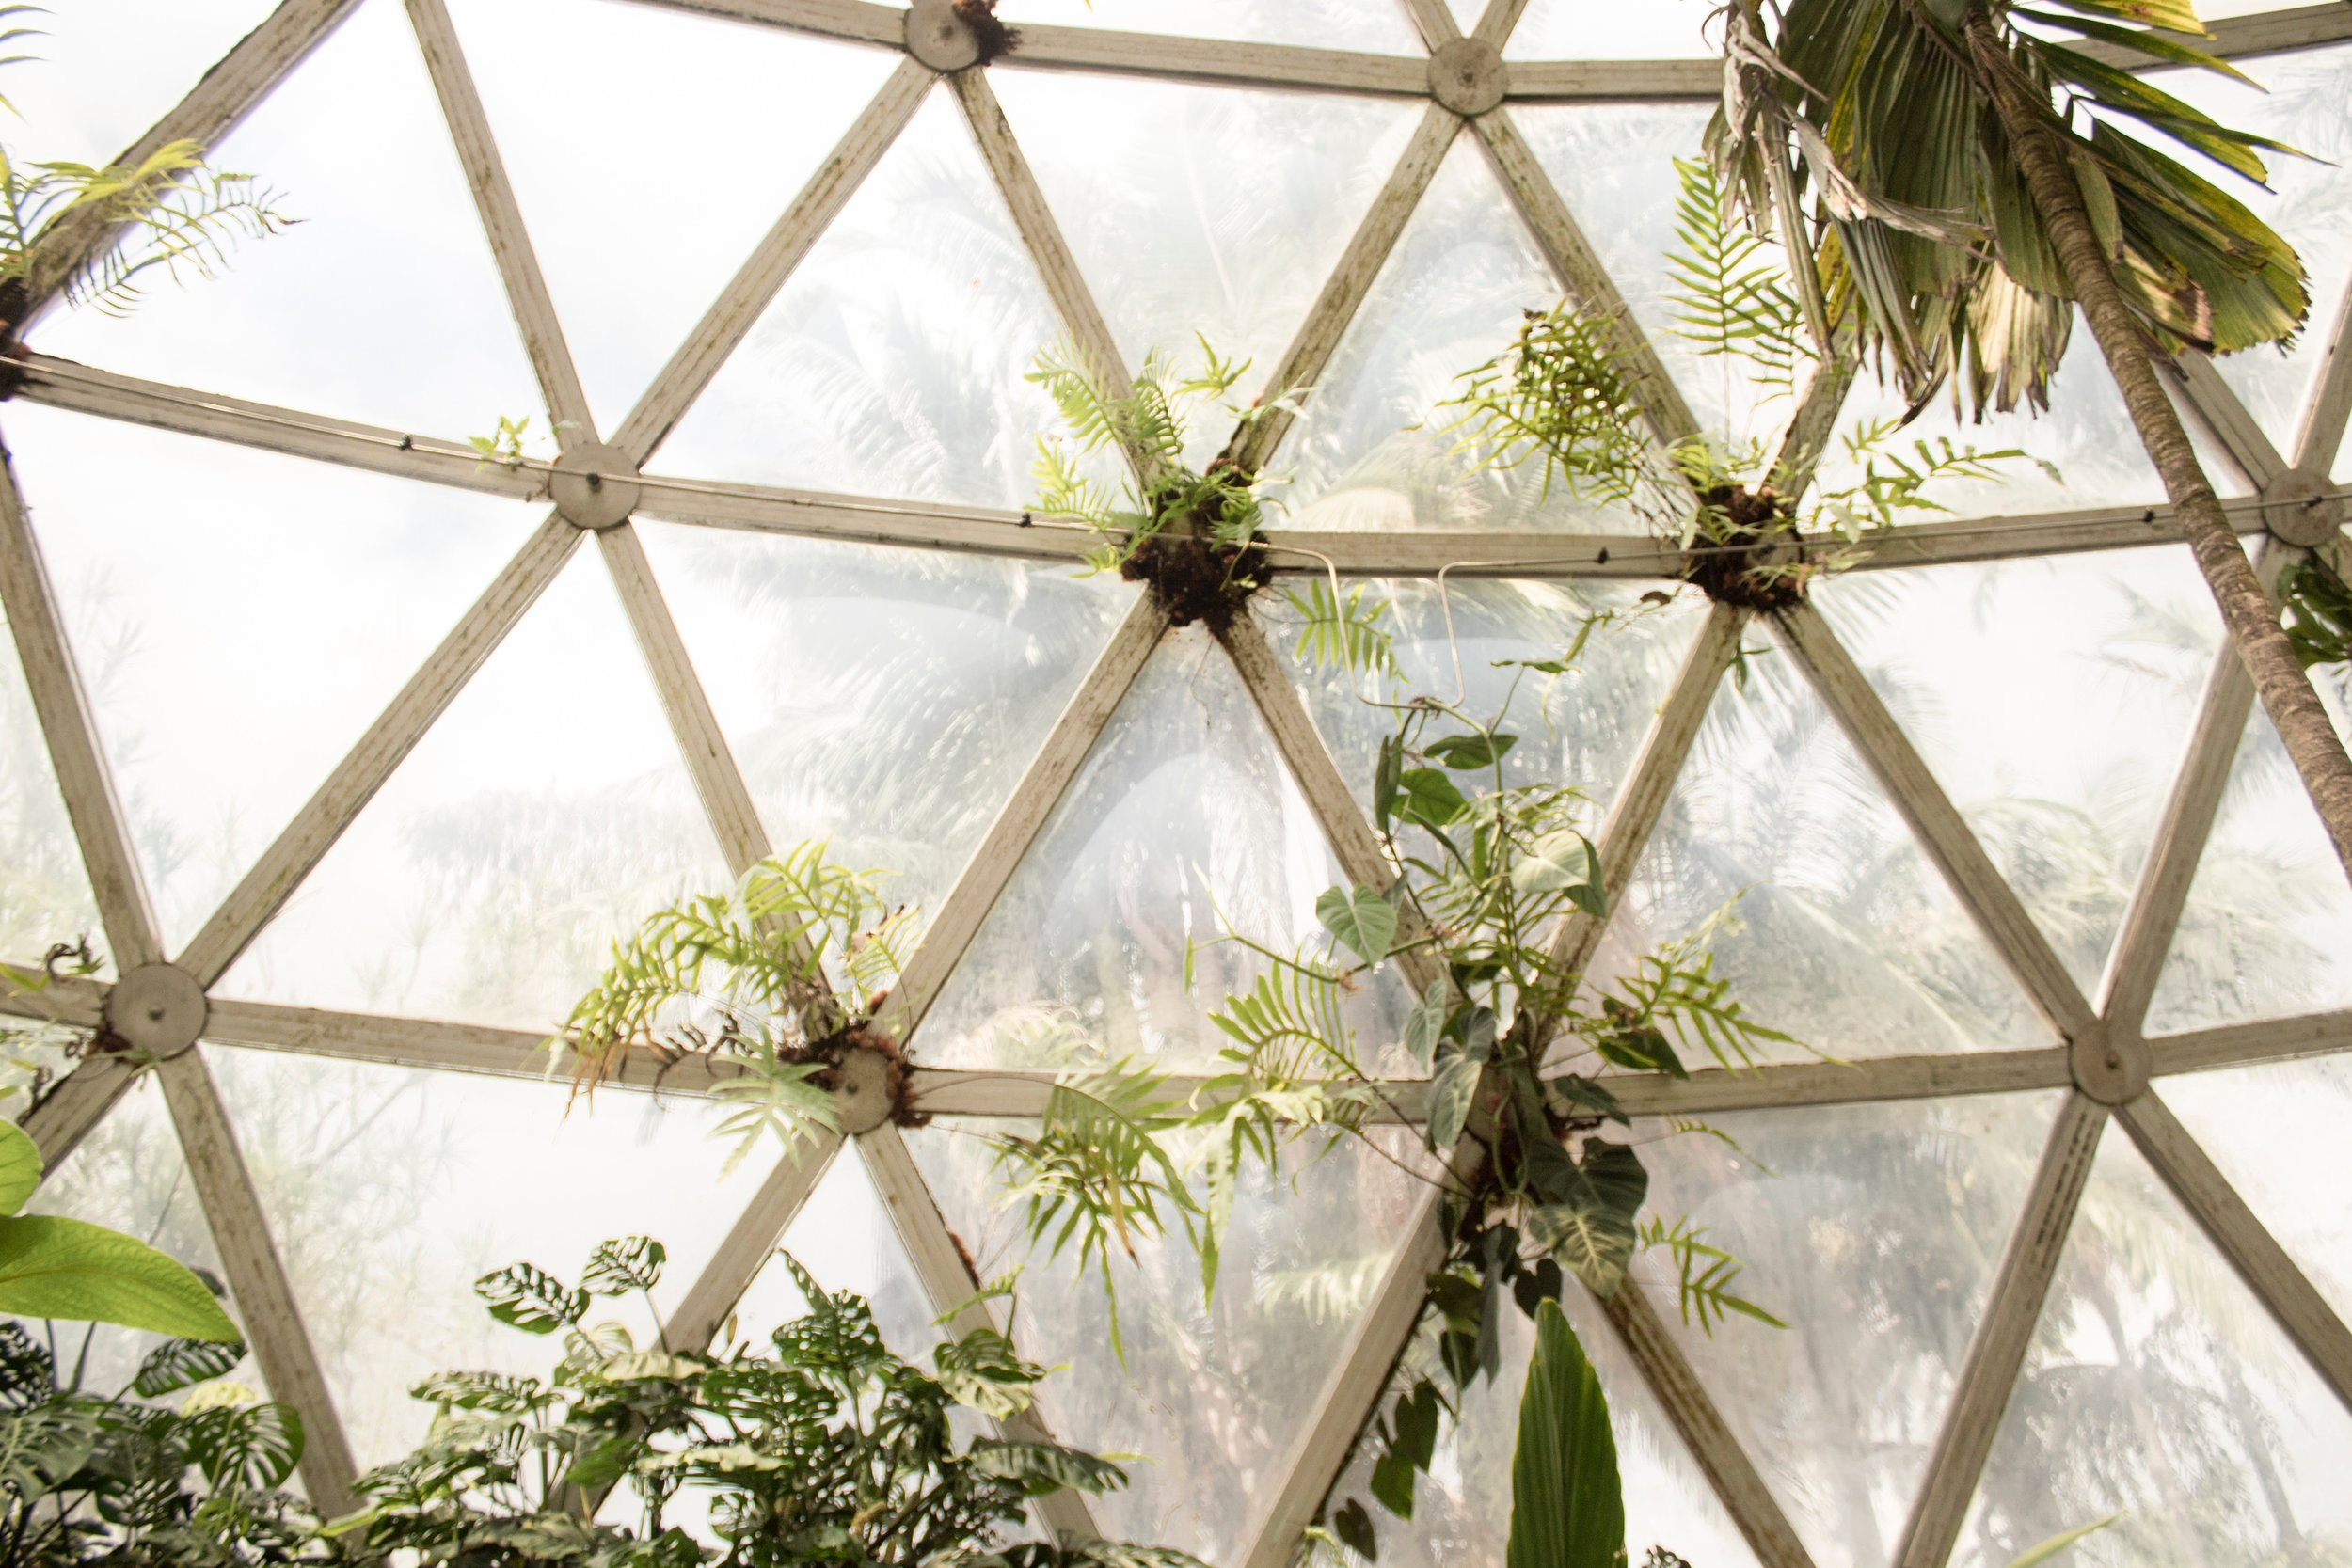 Latticed Window in Greenhouse